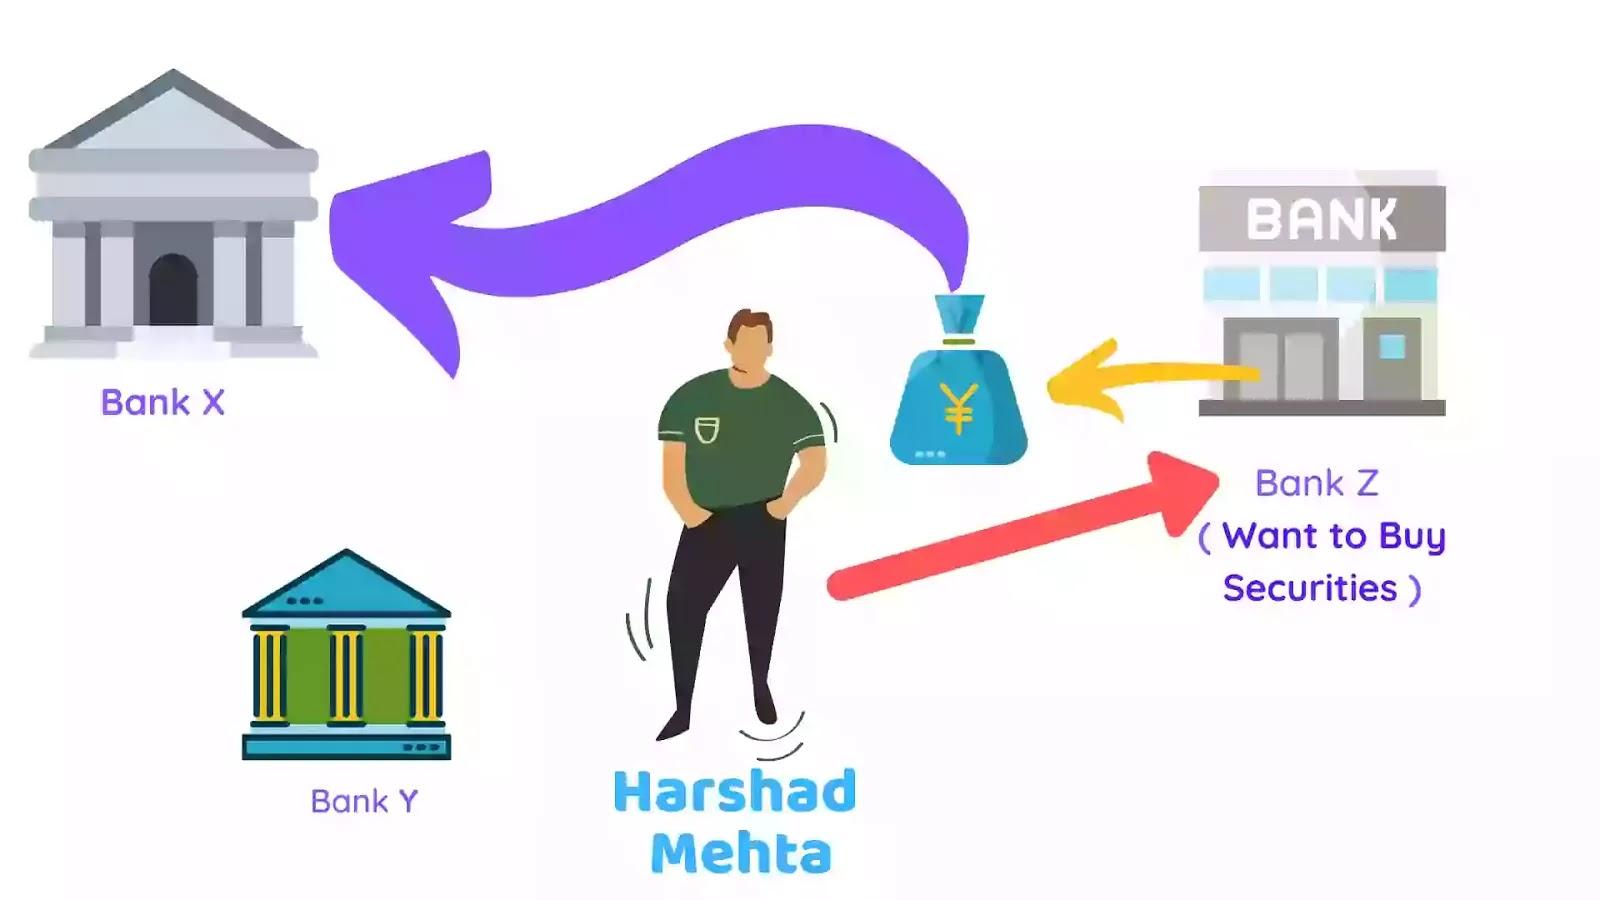 How Harshad Mehta Got Benefited